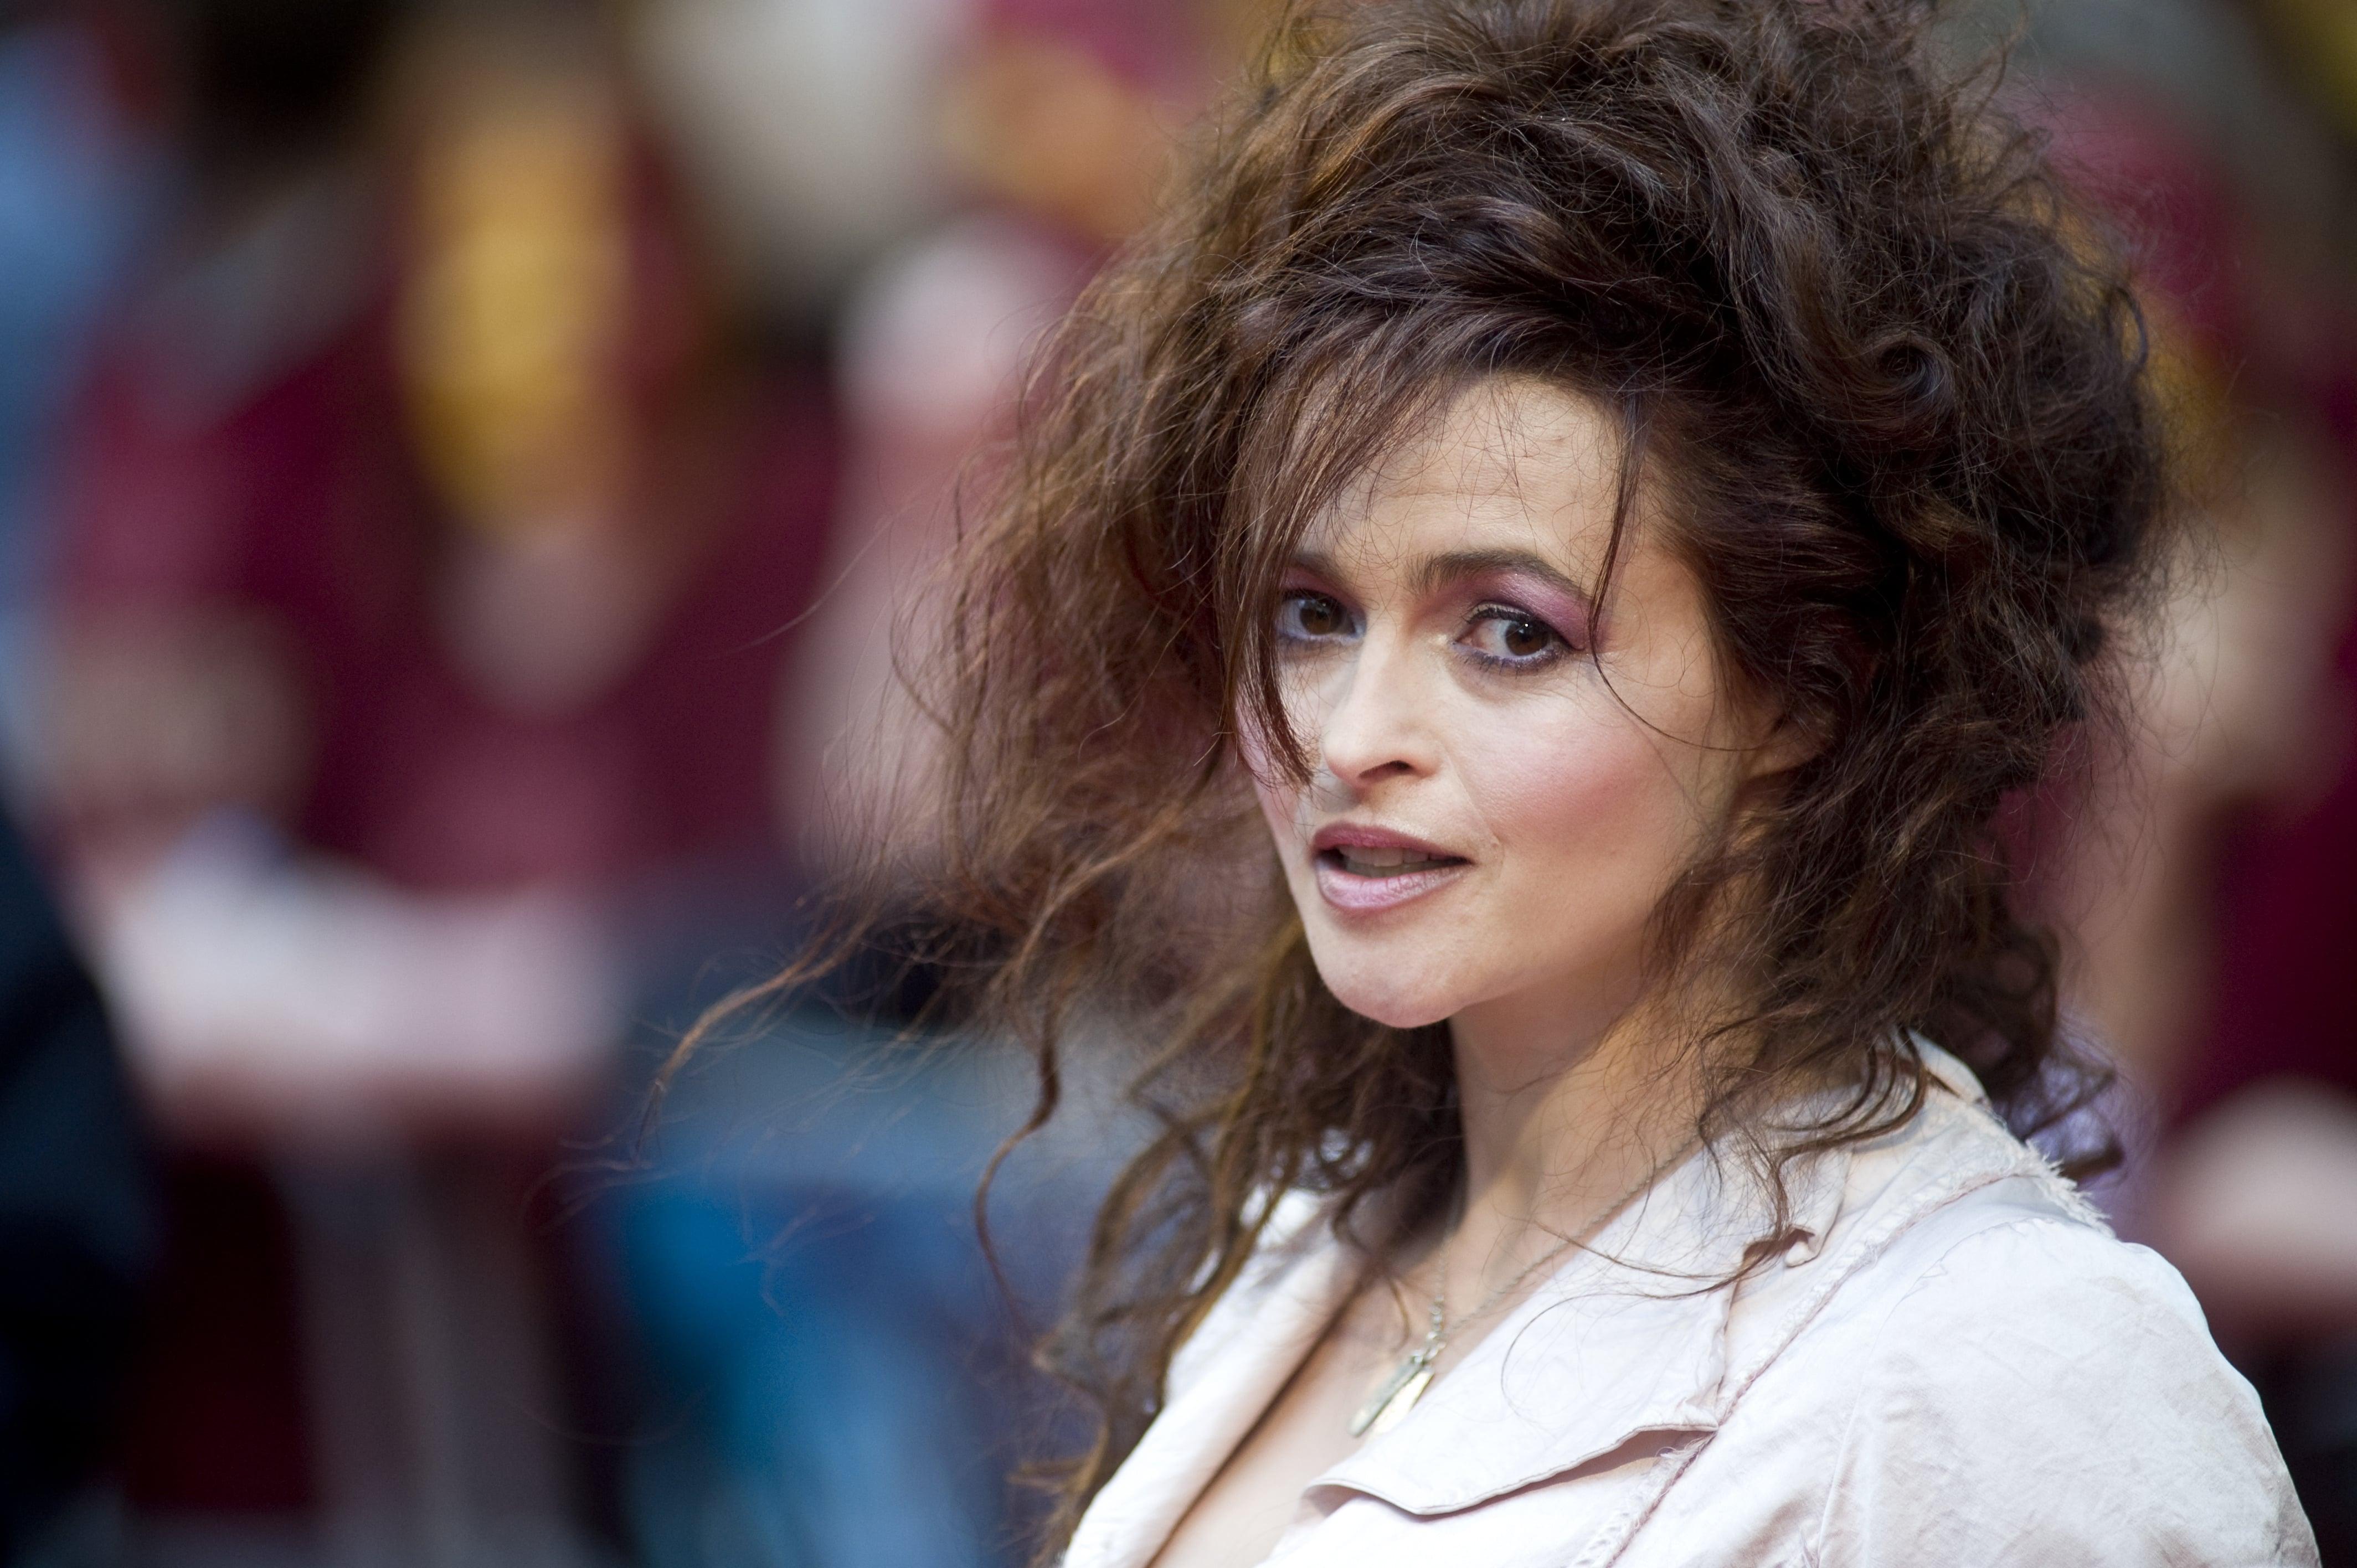 Helena Bonham Carter HQ wallpapers